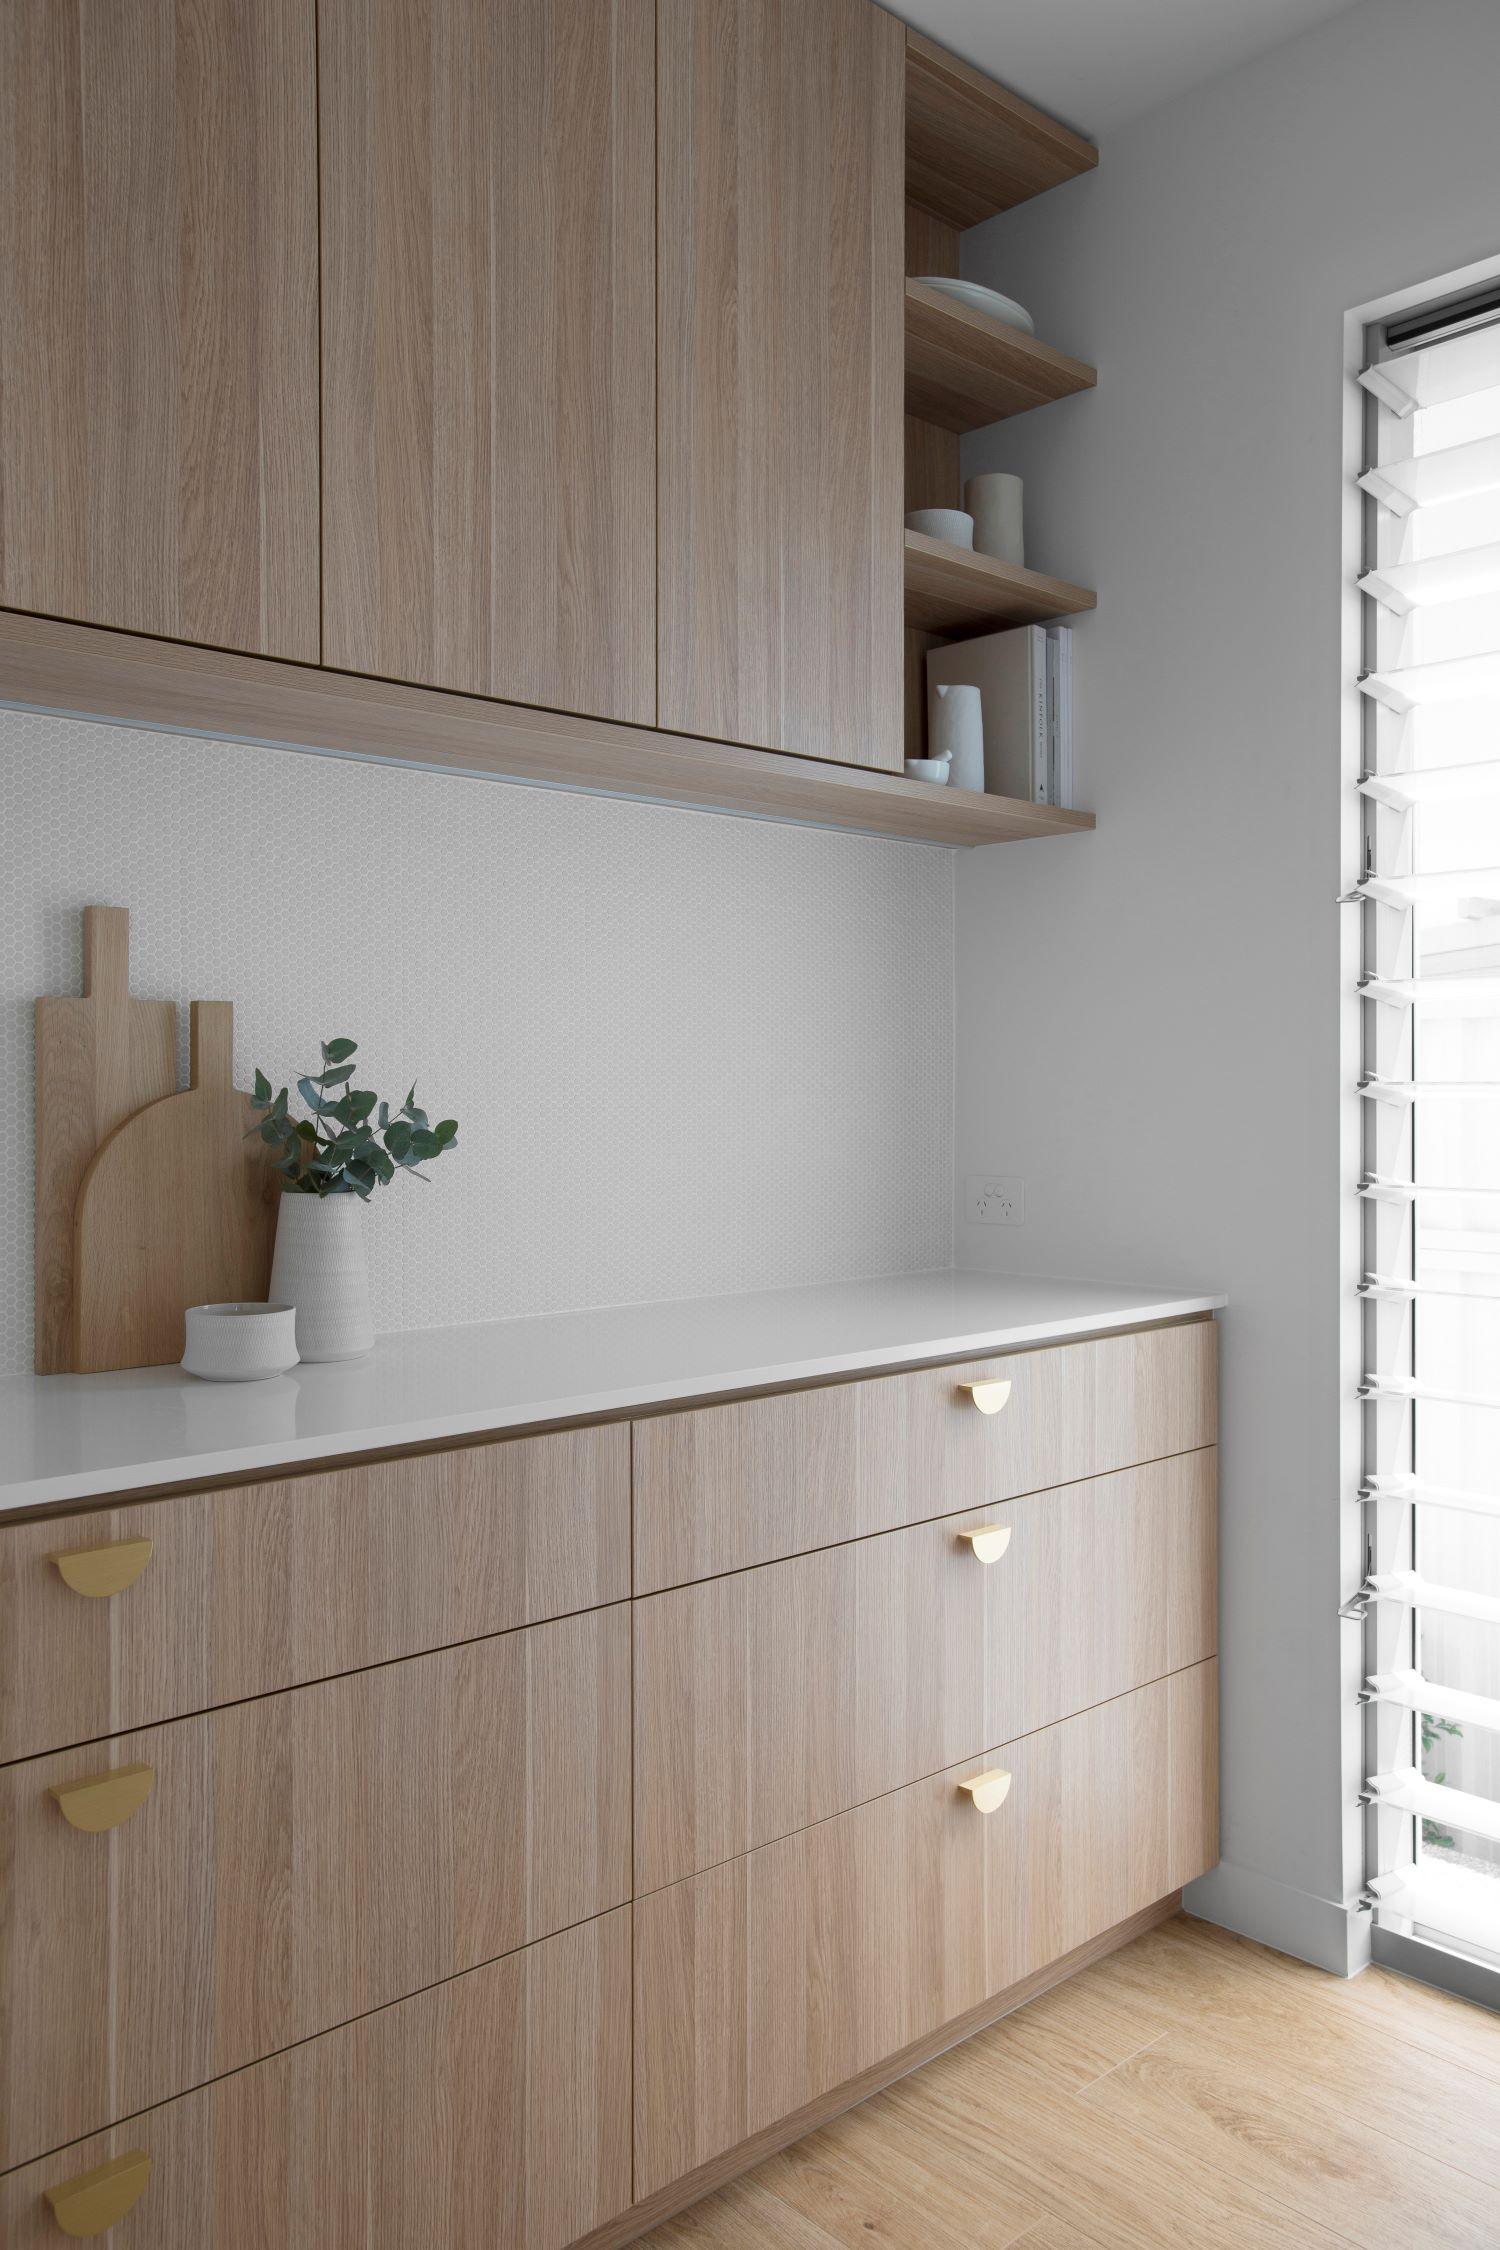 zephyr-stone-interior-design-influencers-coastal-butlers-pantry